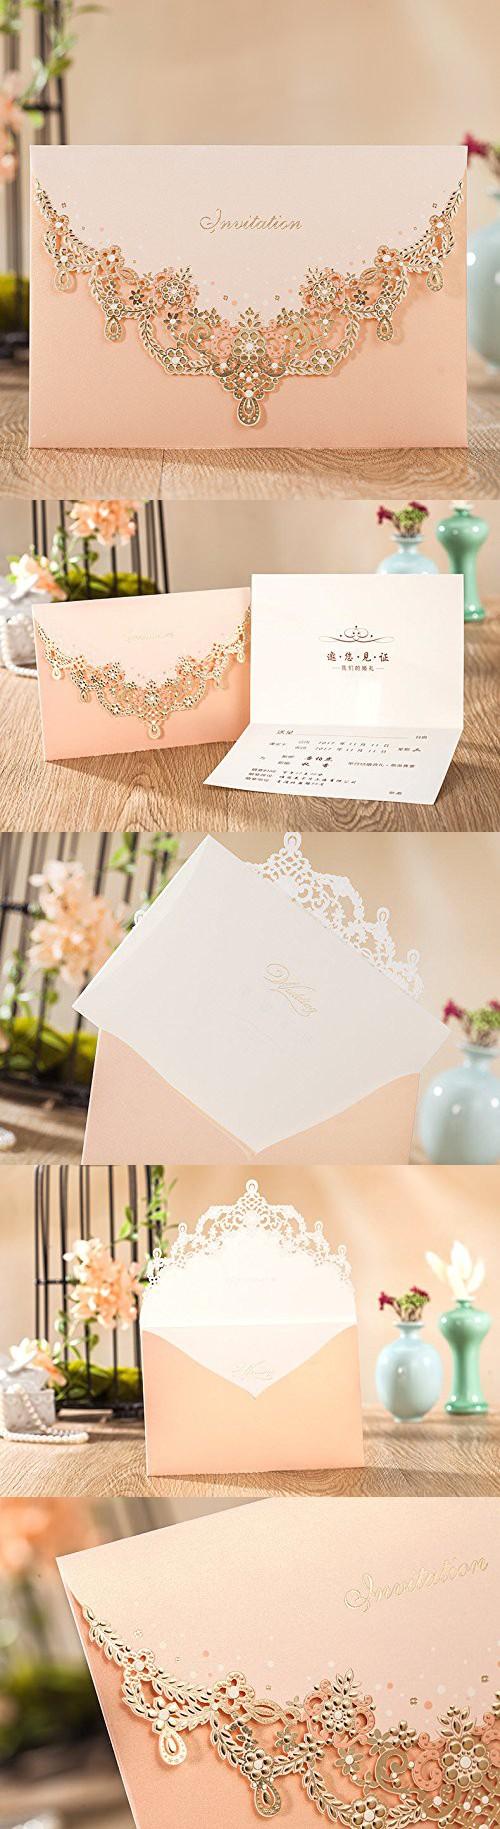 starfish wedding invitation kits%0A Wishmade Wedding Invitations Cards  Light Pink     Pieces  CW       Customized Printing